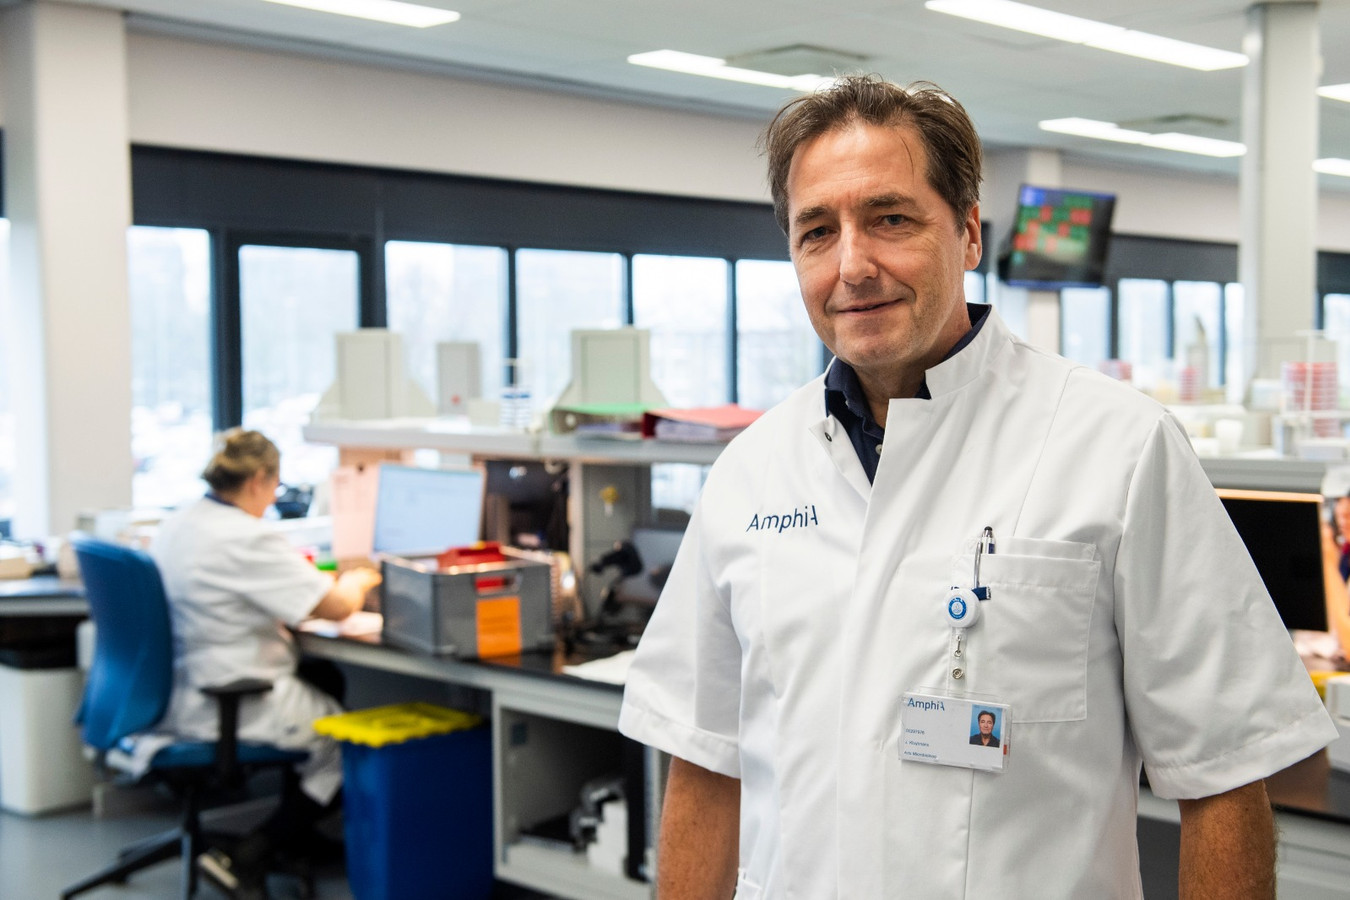 Jan Kluytmans, arts-microbioloog in het Amphia-ziekenhuis in Breda.